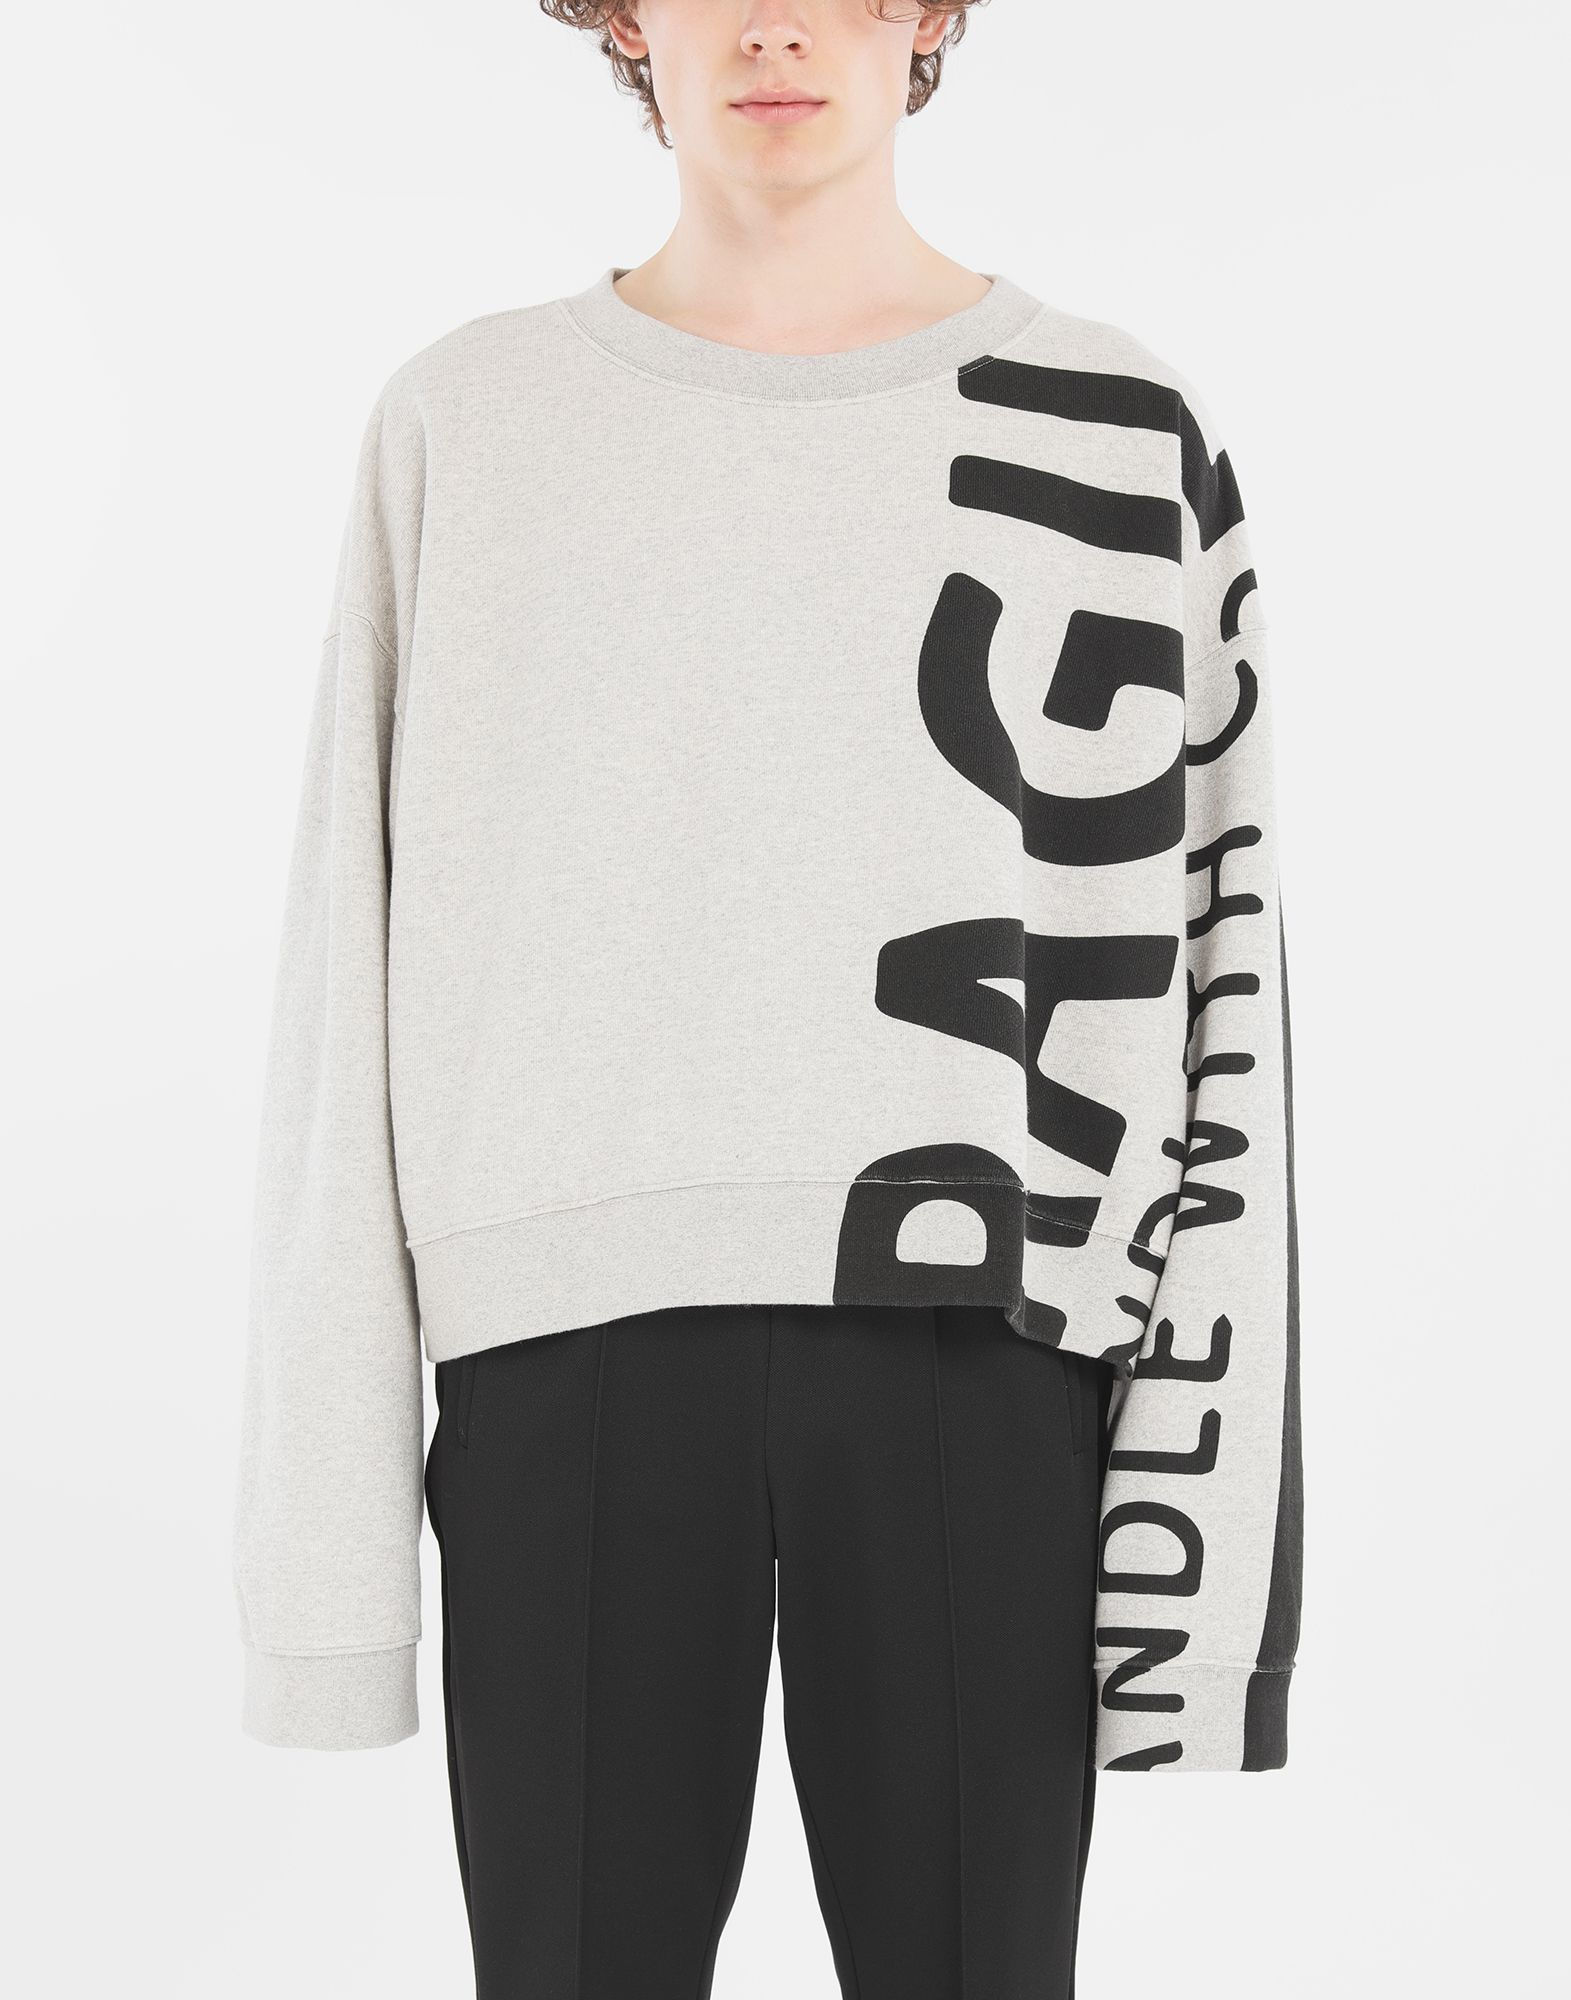 MAISON MARGIELA 'Fragile' sweatshirt Sweatshirt Man r